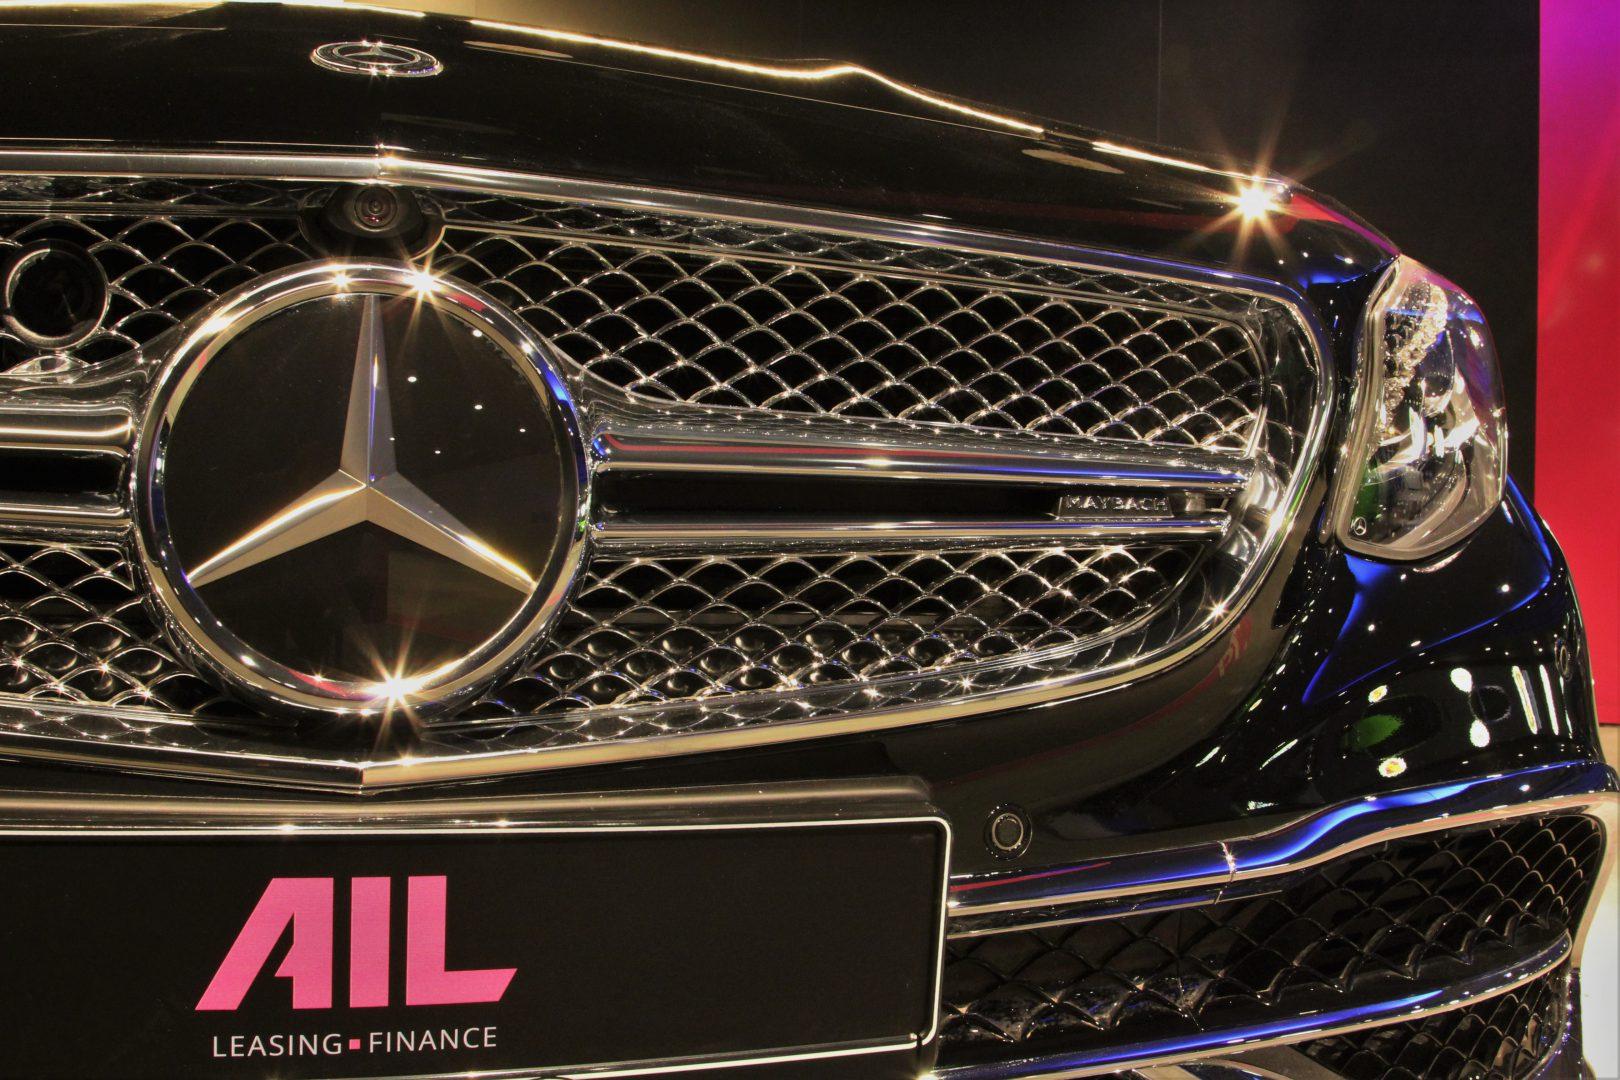 AIL Mercedes-Benz S650 MAYBACH V12 Exklusiv-Paket 6